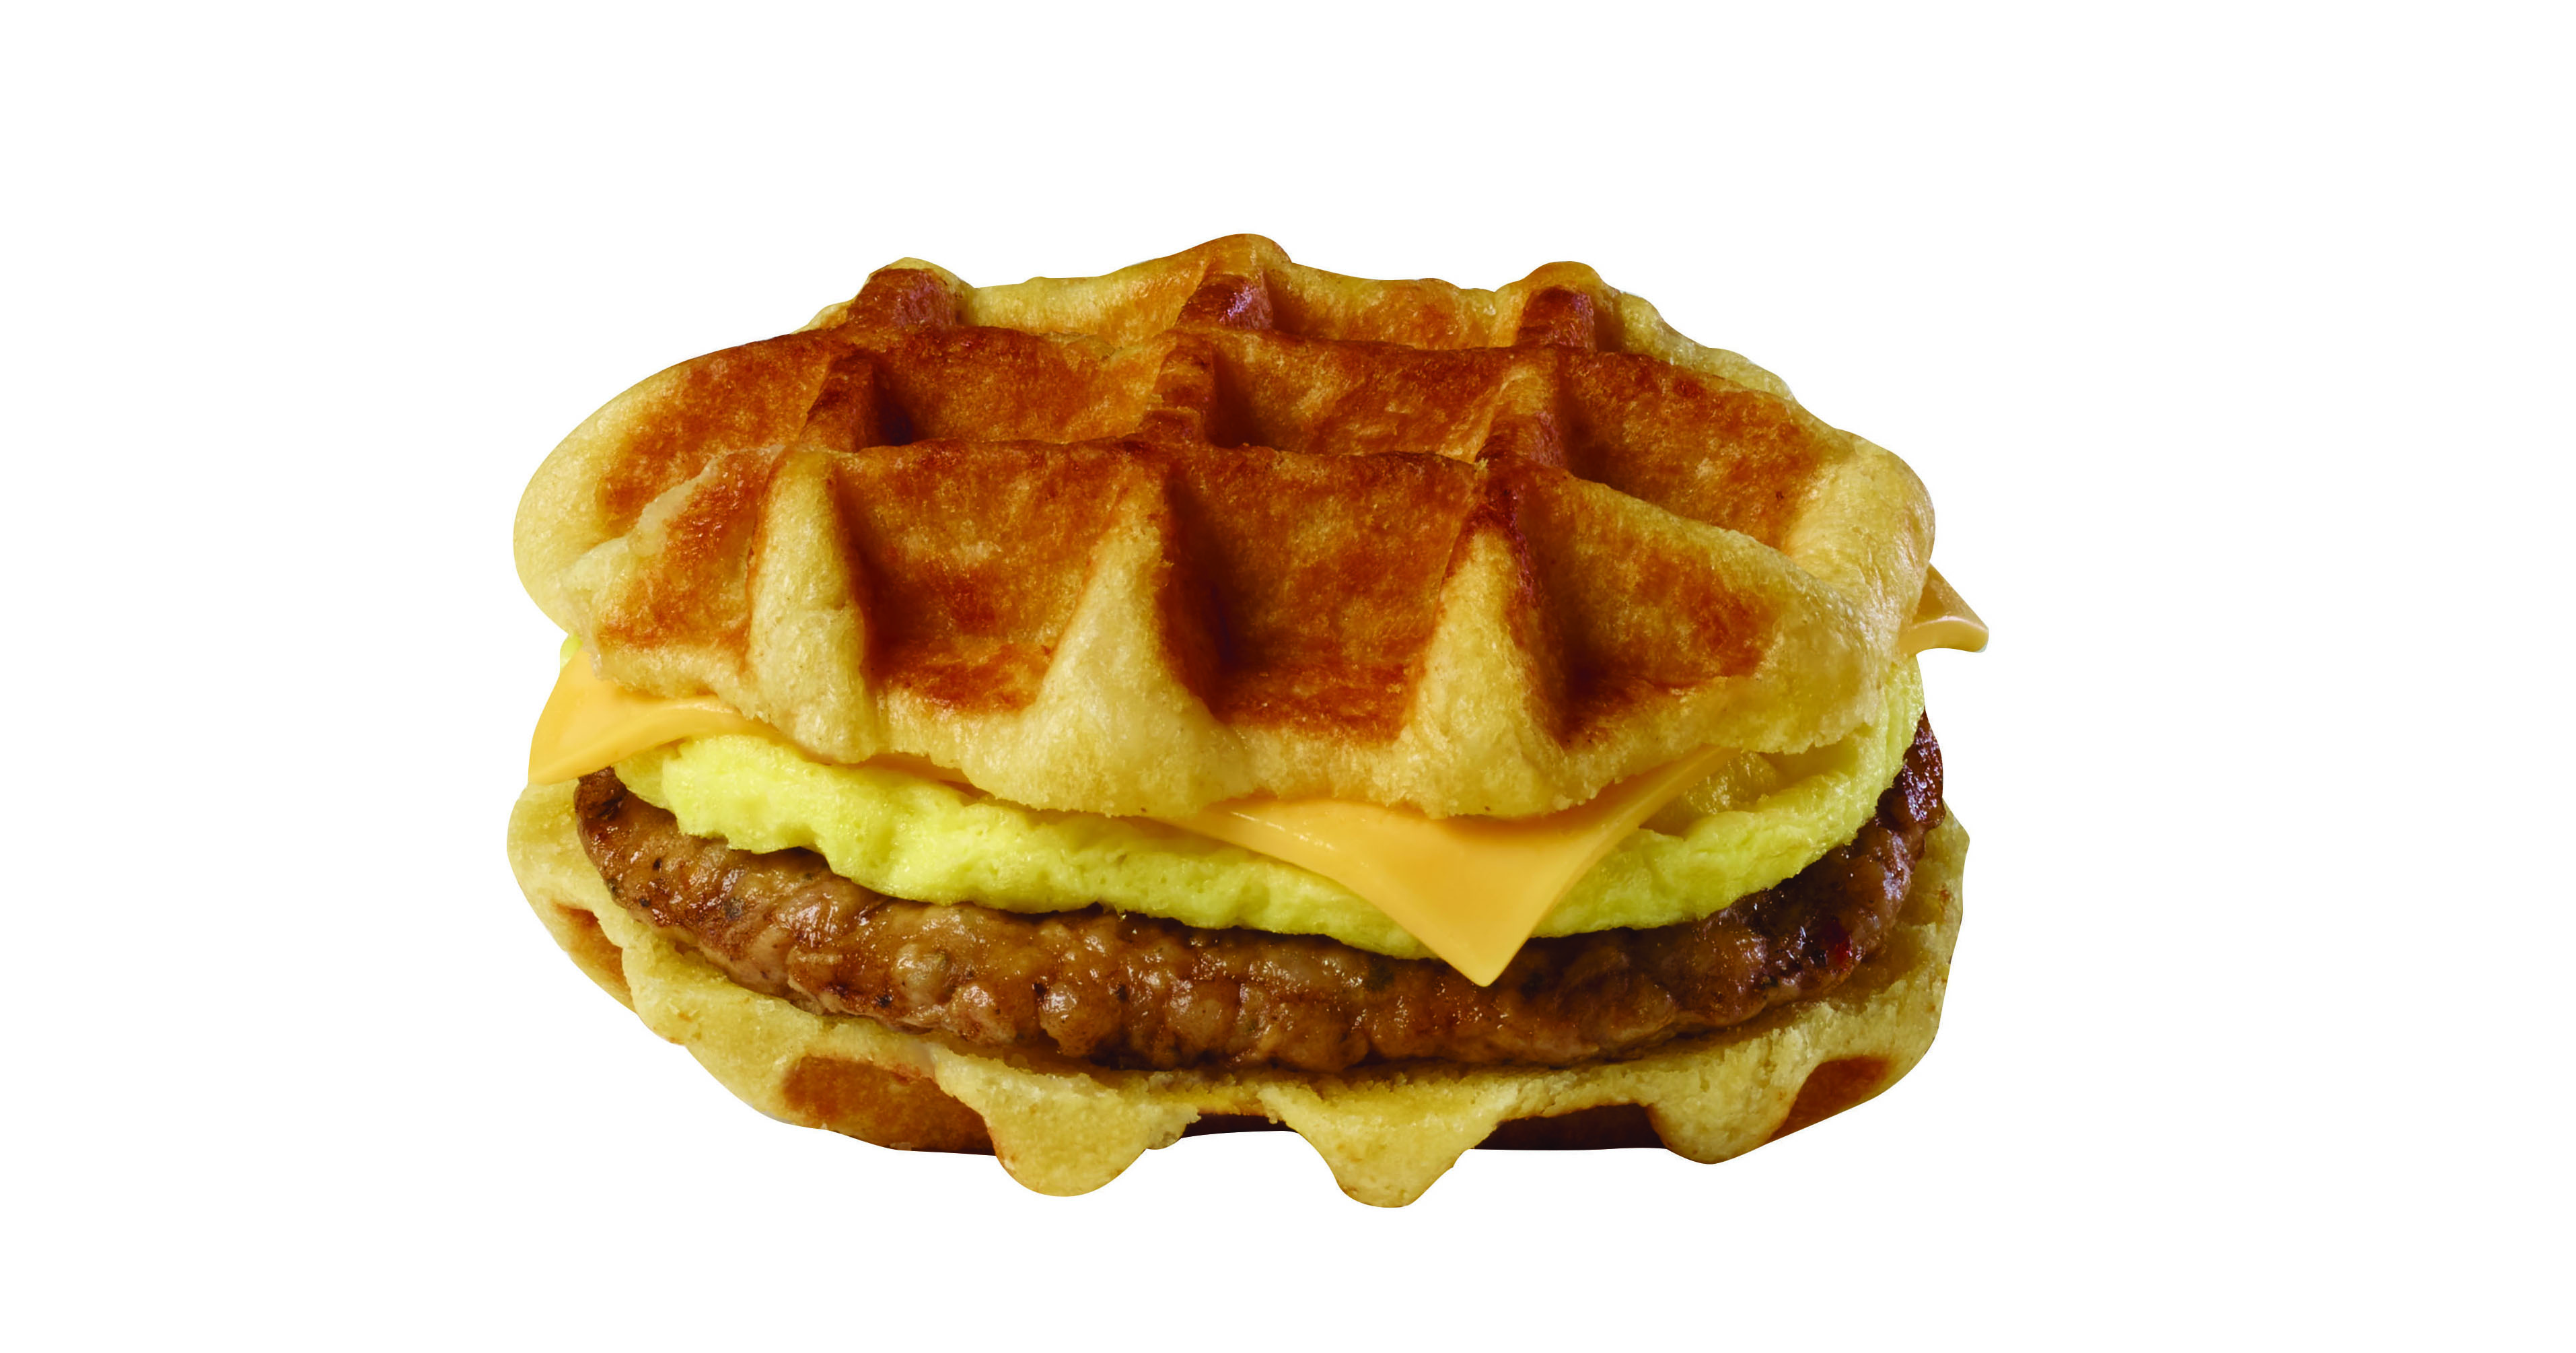 Sliced Sandwich Waffles